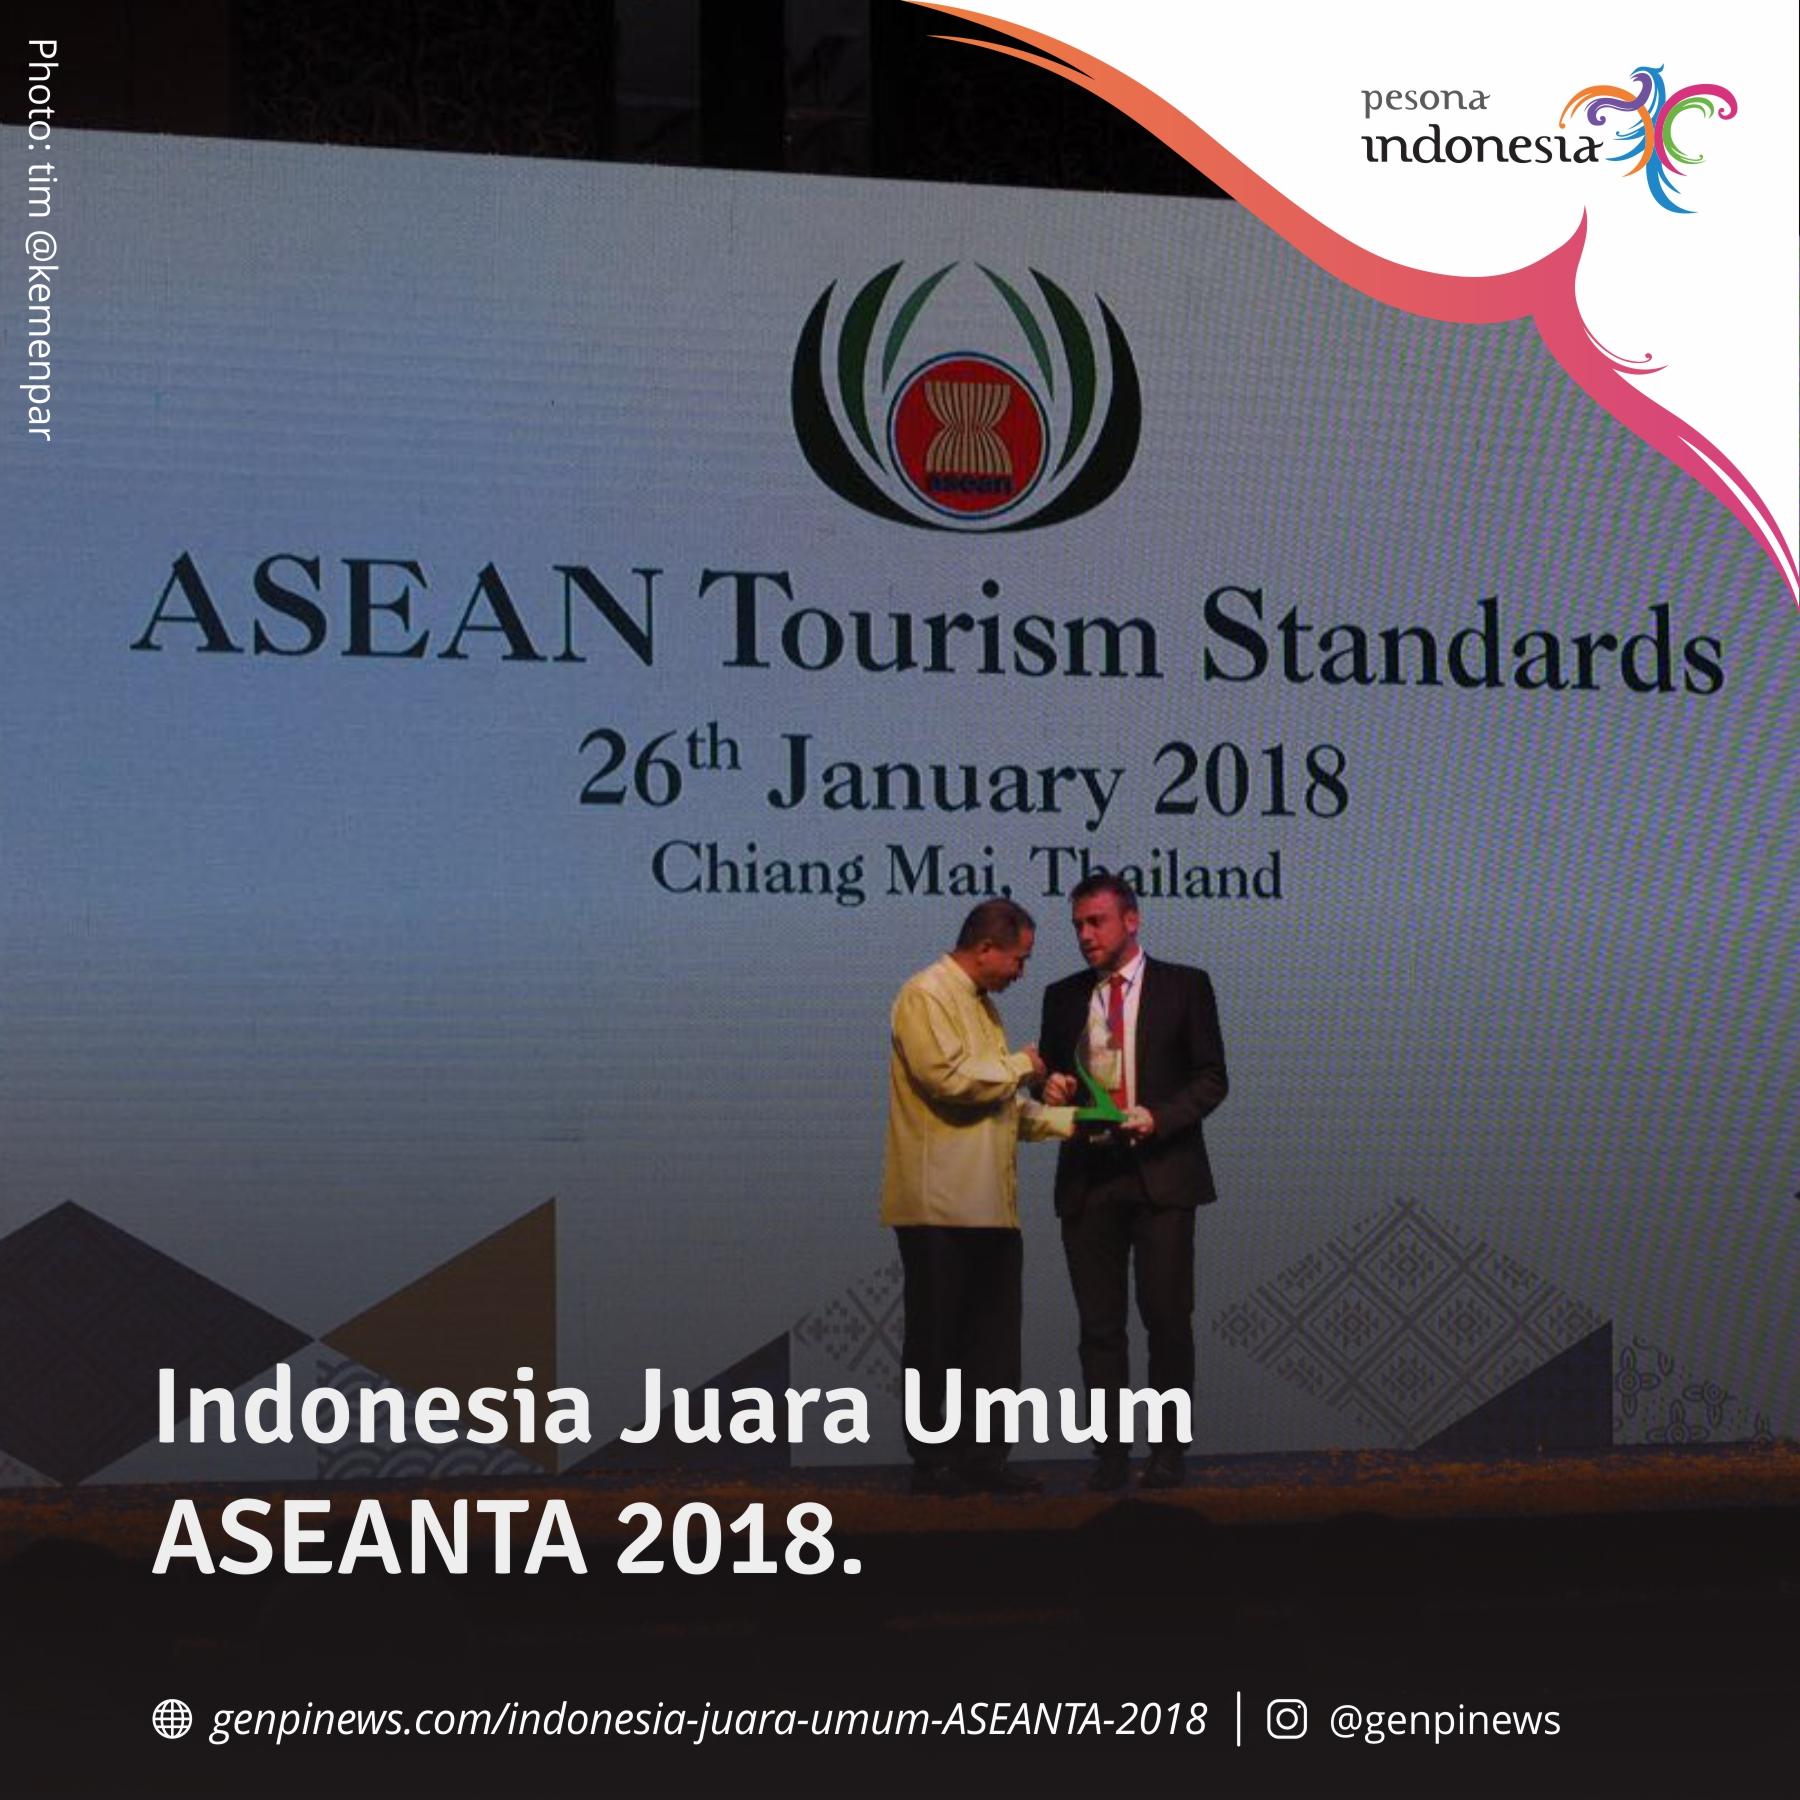 Indonesia Juara Umum ASEAN Tourism Award